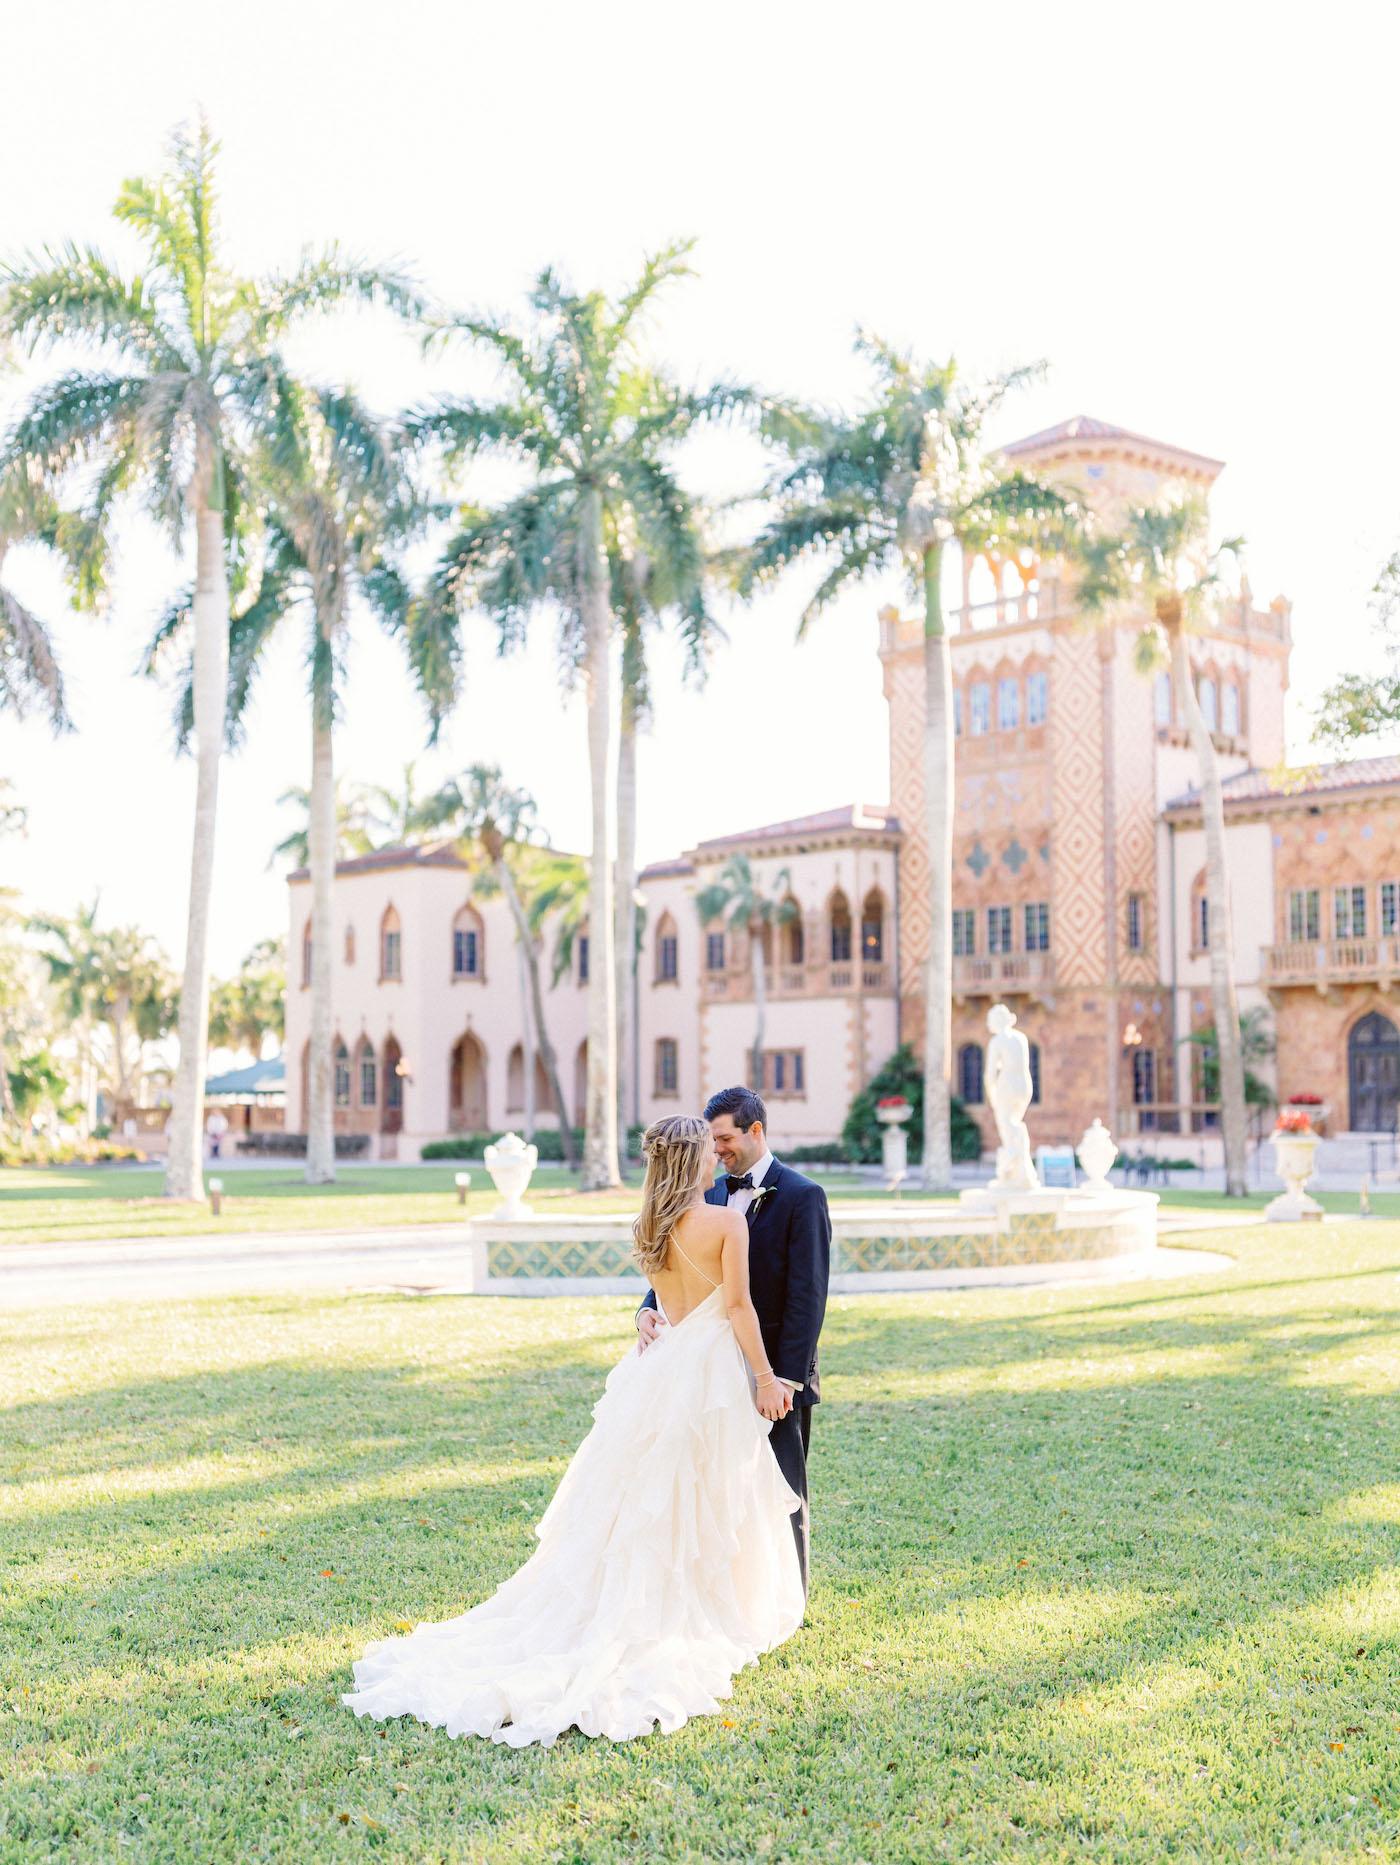 Romantic, Modern Florida Bride and Groom In Courtyard in Ringling Mansion Belvedere Tower | Sarasota Wedding Planner NK Weddings